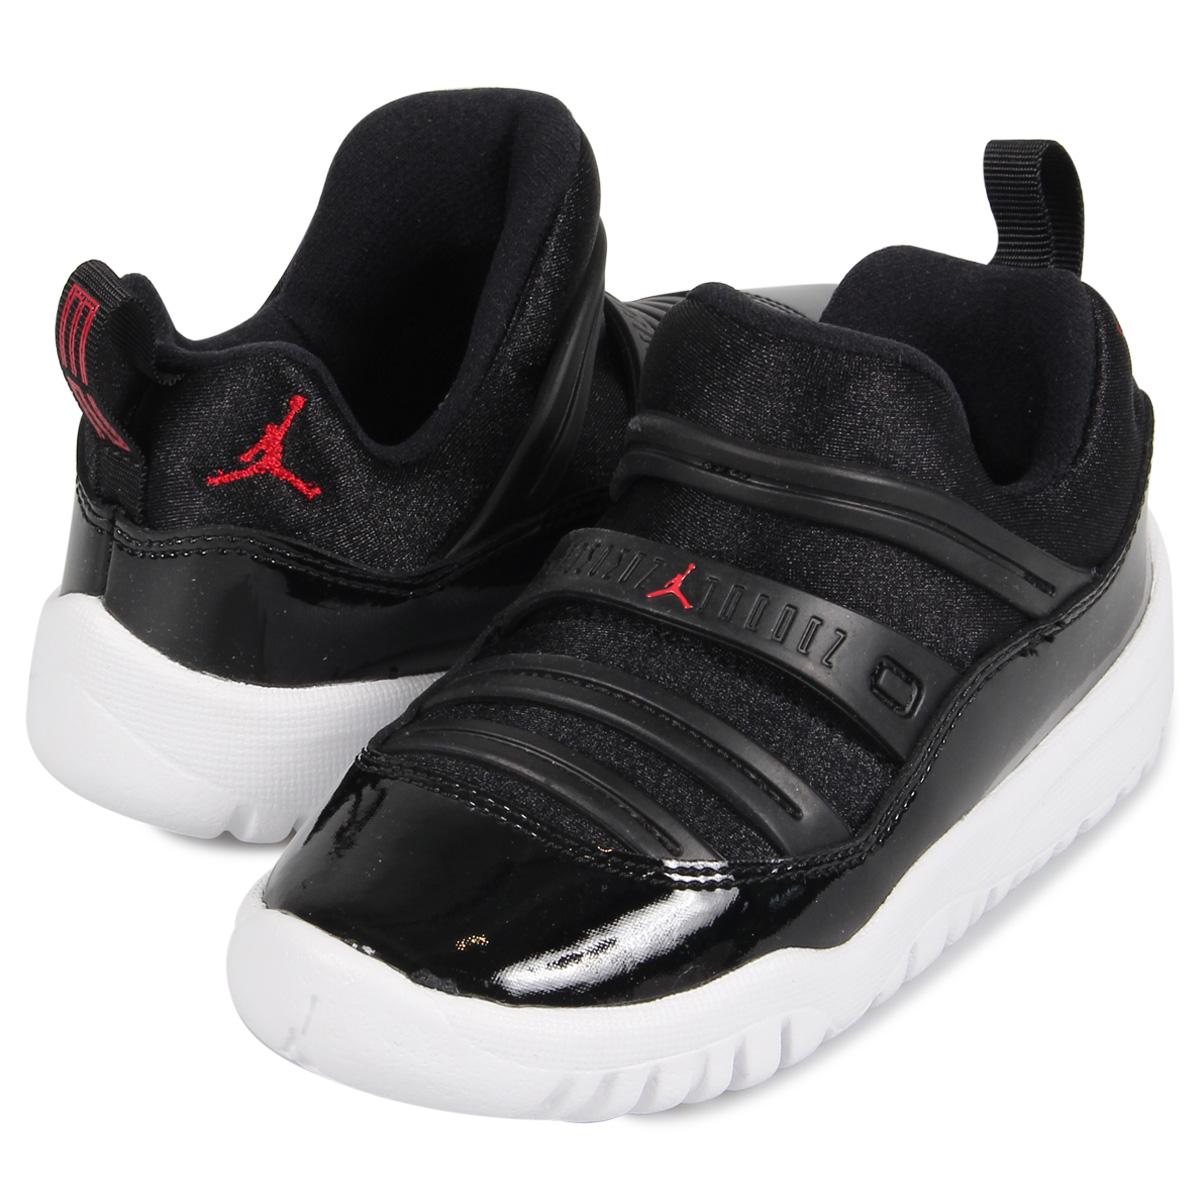 more photos 770a4 ec9b6 Nike NIKE Air Jordan 11 nostalgic sneakers slip-ons baby kids AIR JORDAN 11  RETRO LITTLE FLEX TD black black BQ7102-002 [197]